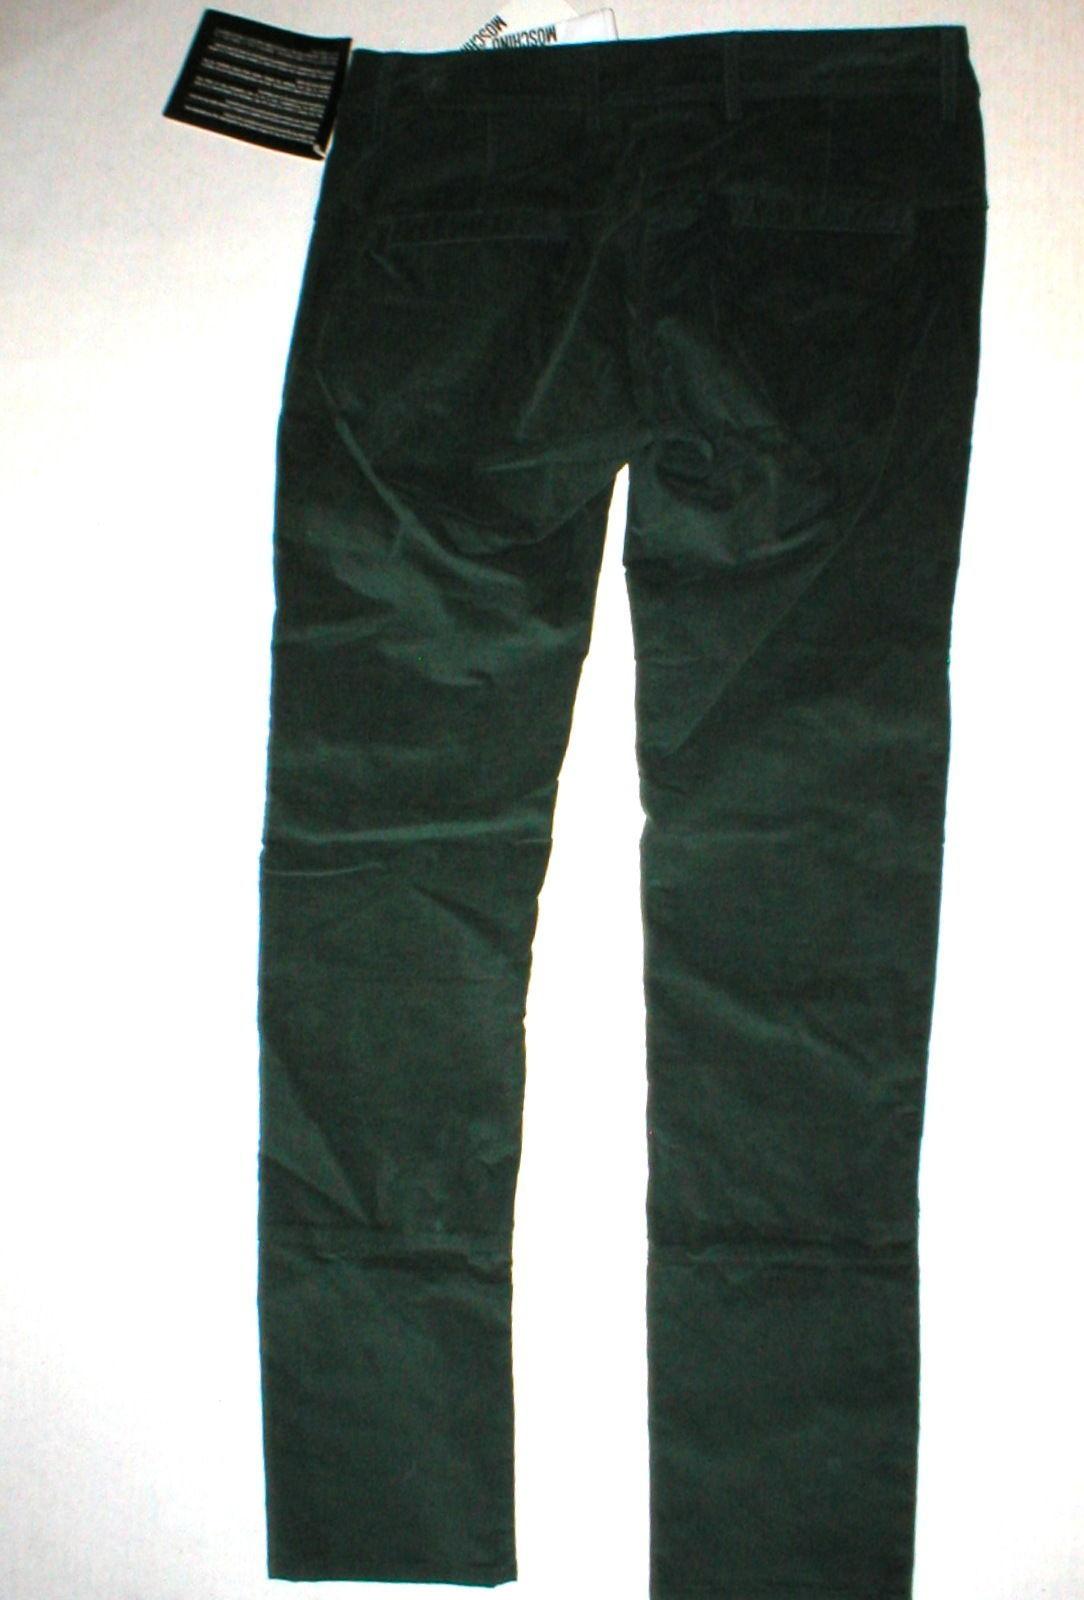 New NWT Womens 4 Dark Designer Love Moschino Green Velvet Pants Corduroy Skinny image 5